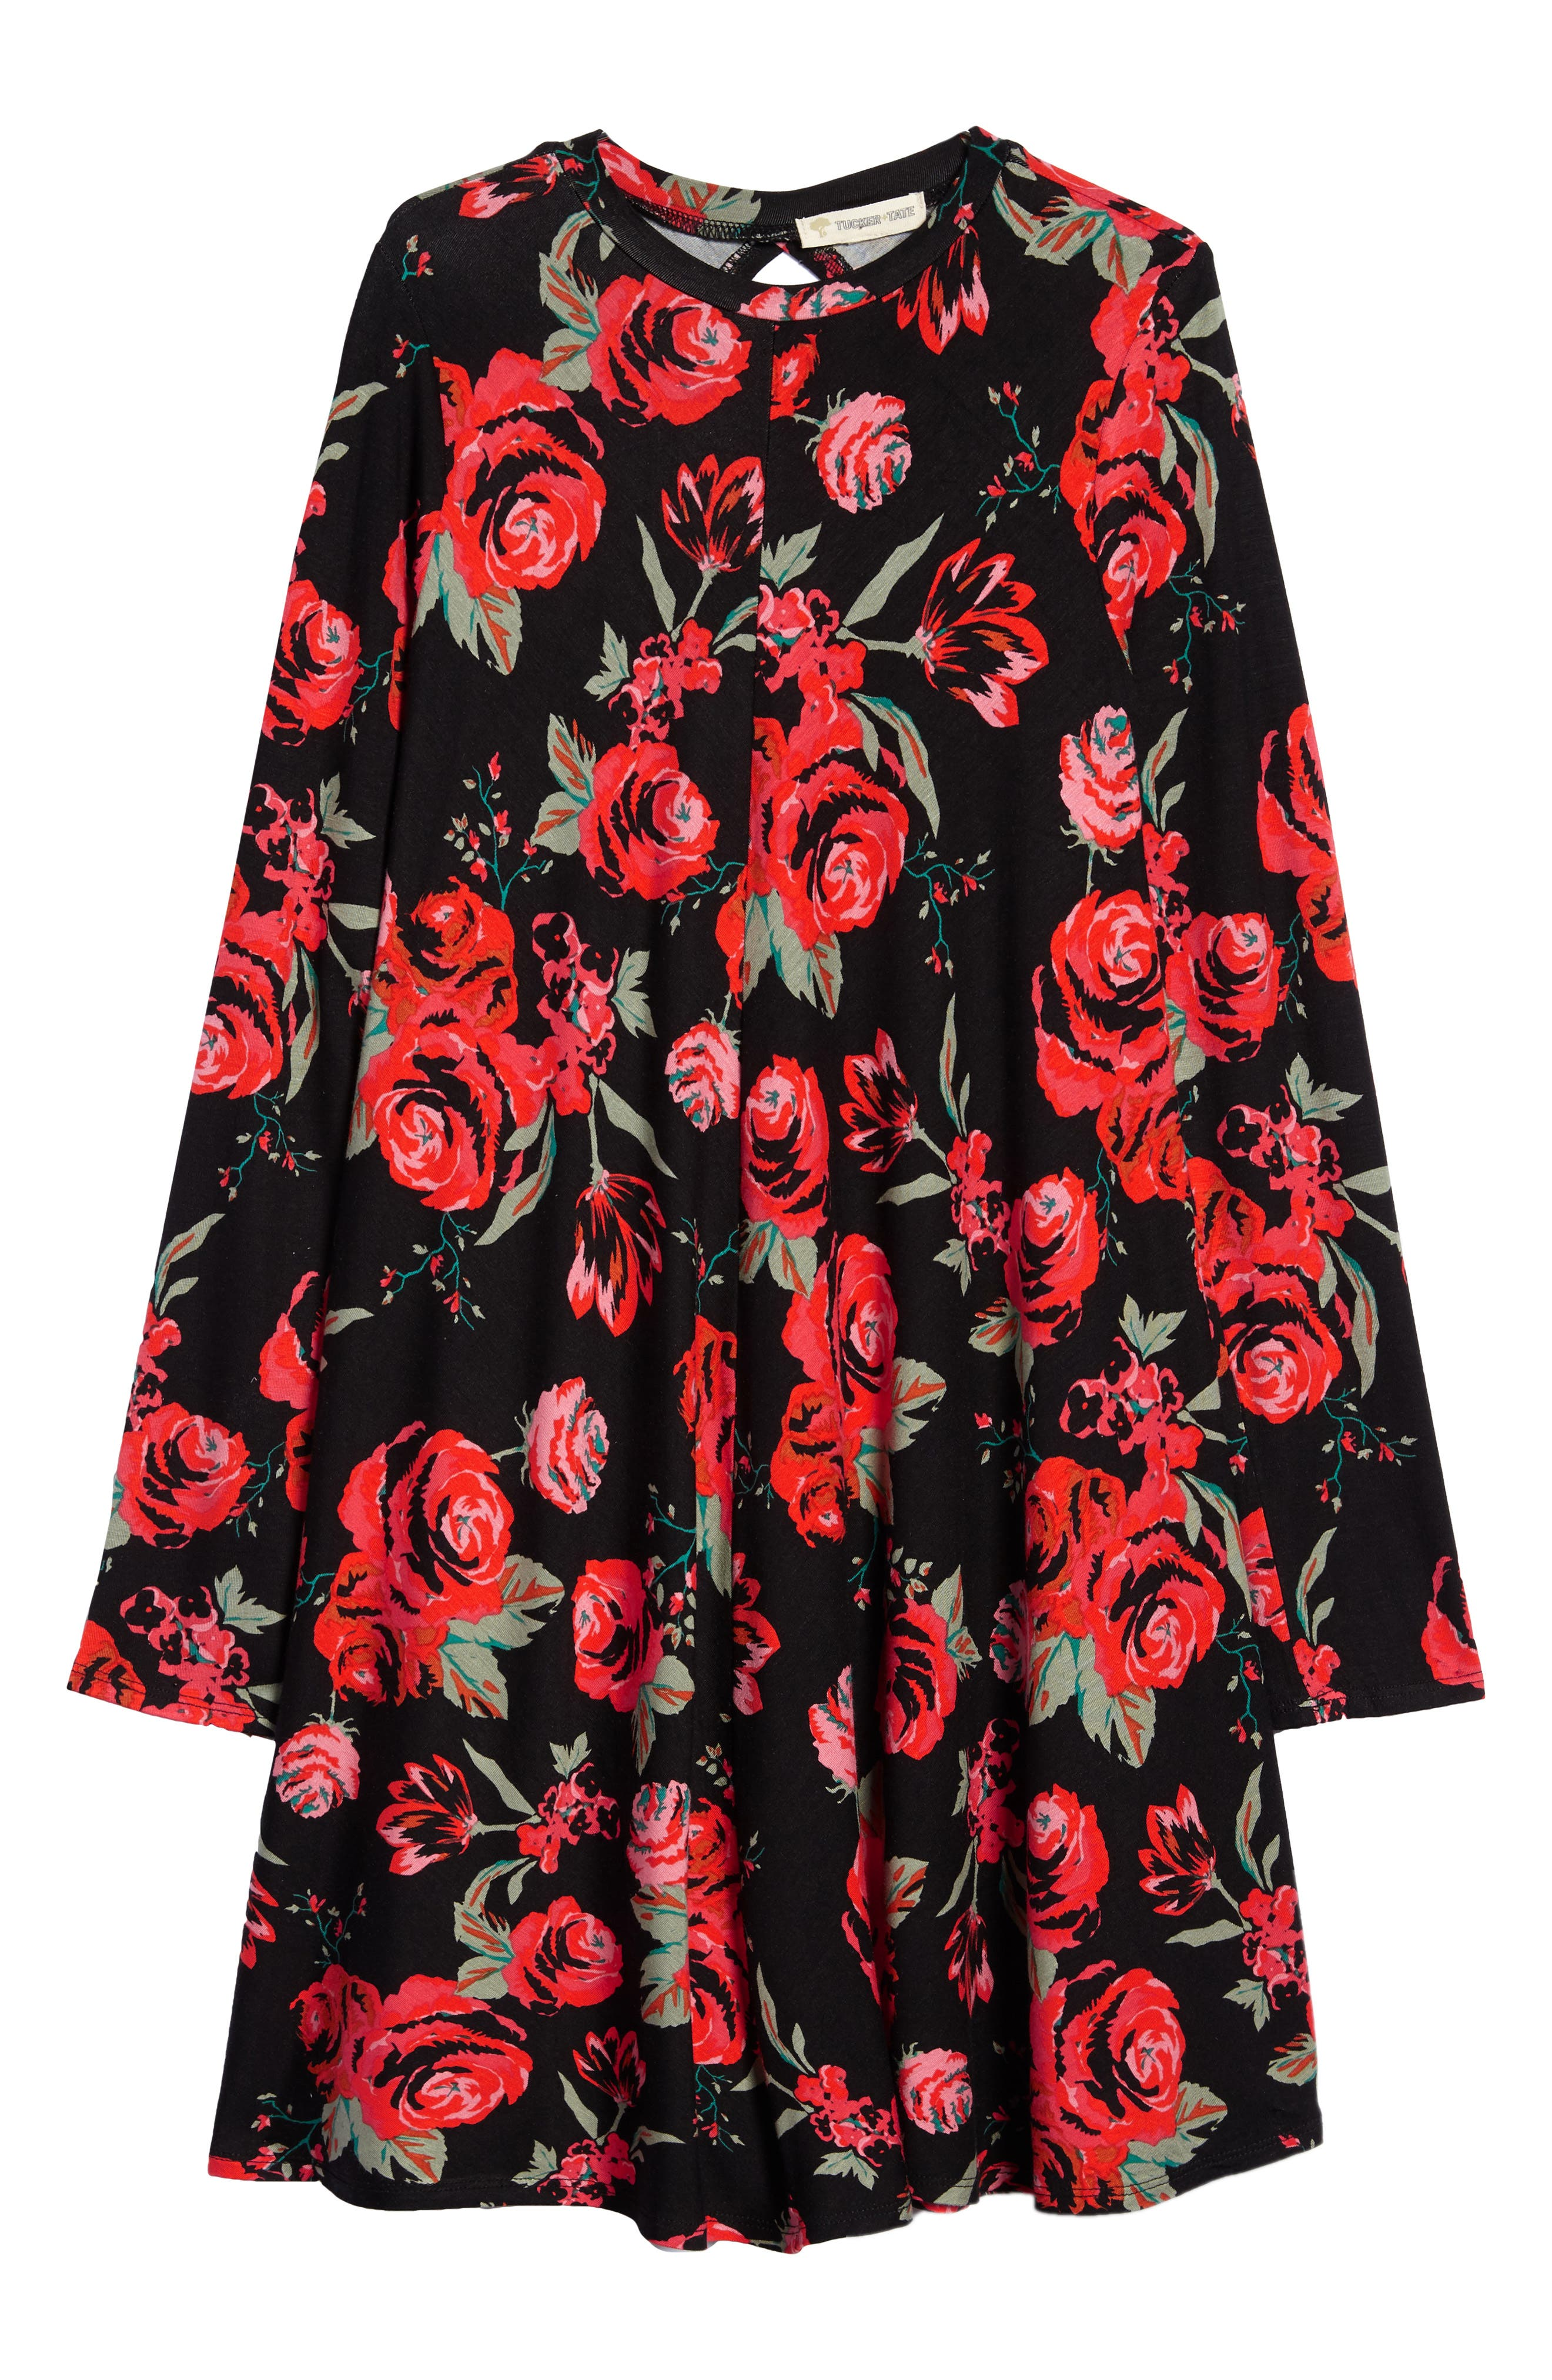 Main Image - Tucker + Tate Floral Print Knit A-Line Dress (Big Girls)